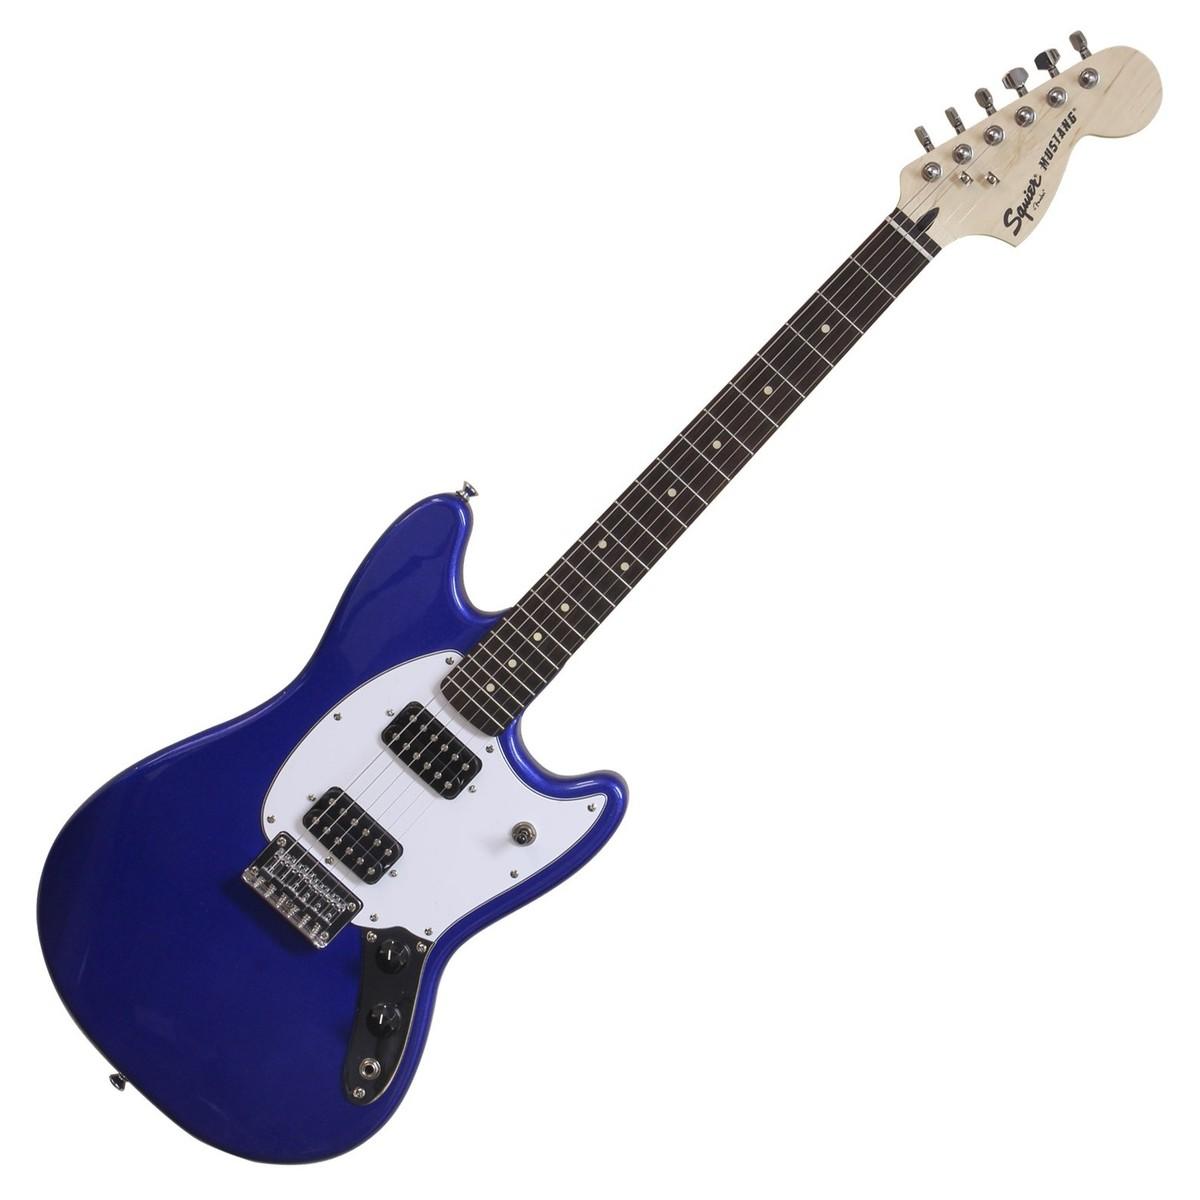 Fender Mustang Guitar Wiring Diagram On Telephone Wiring Supplies